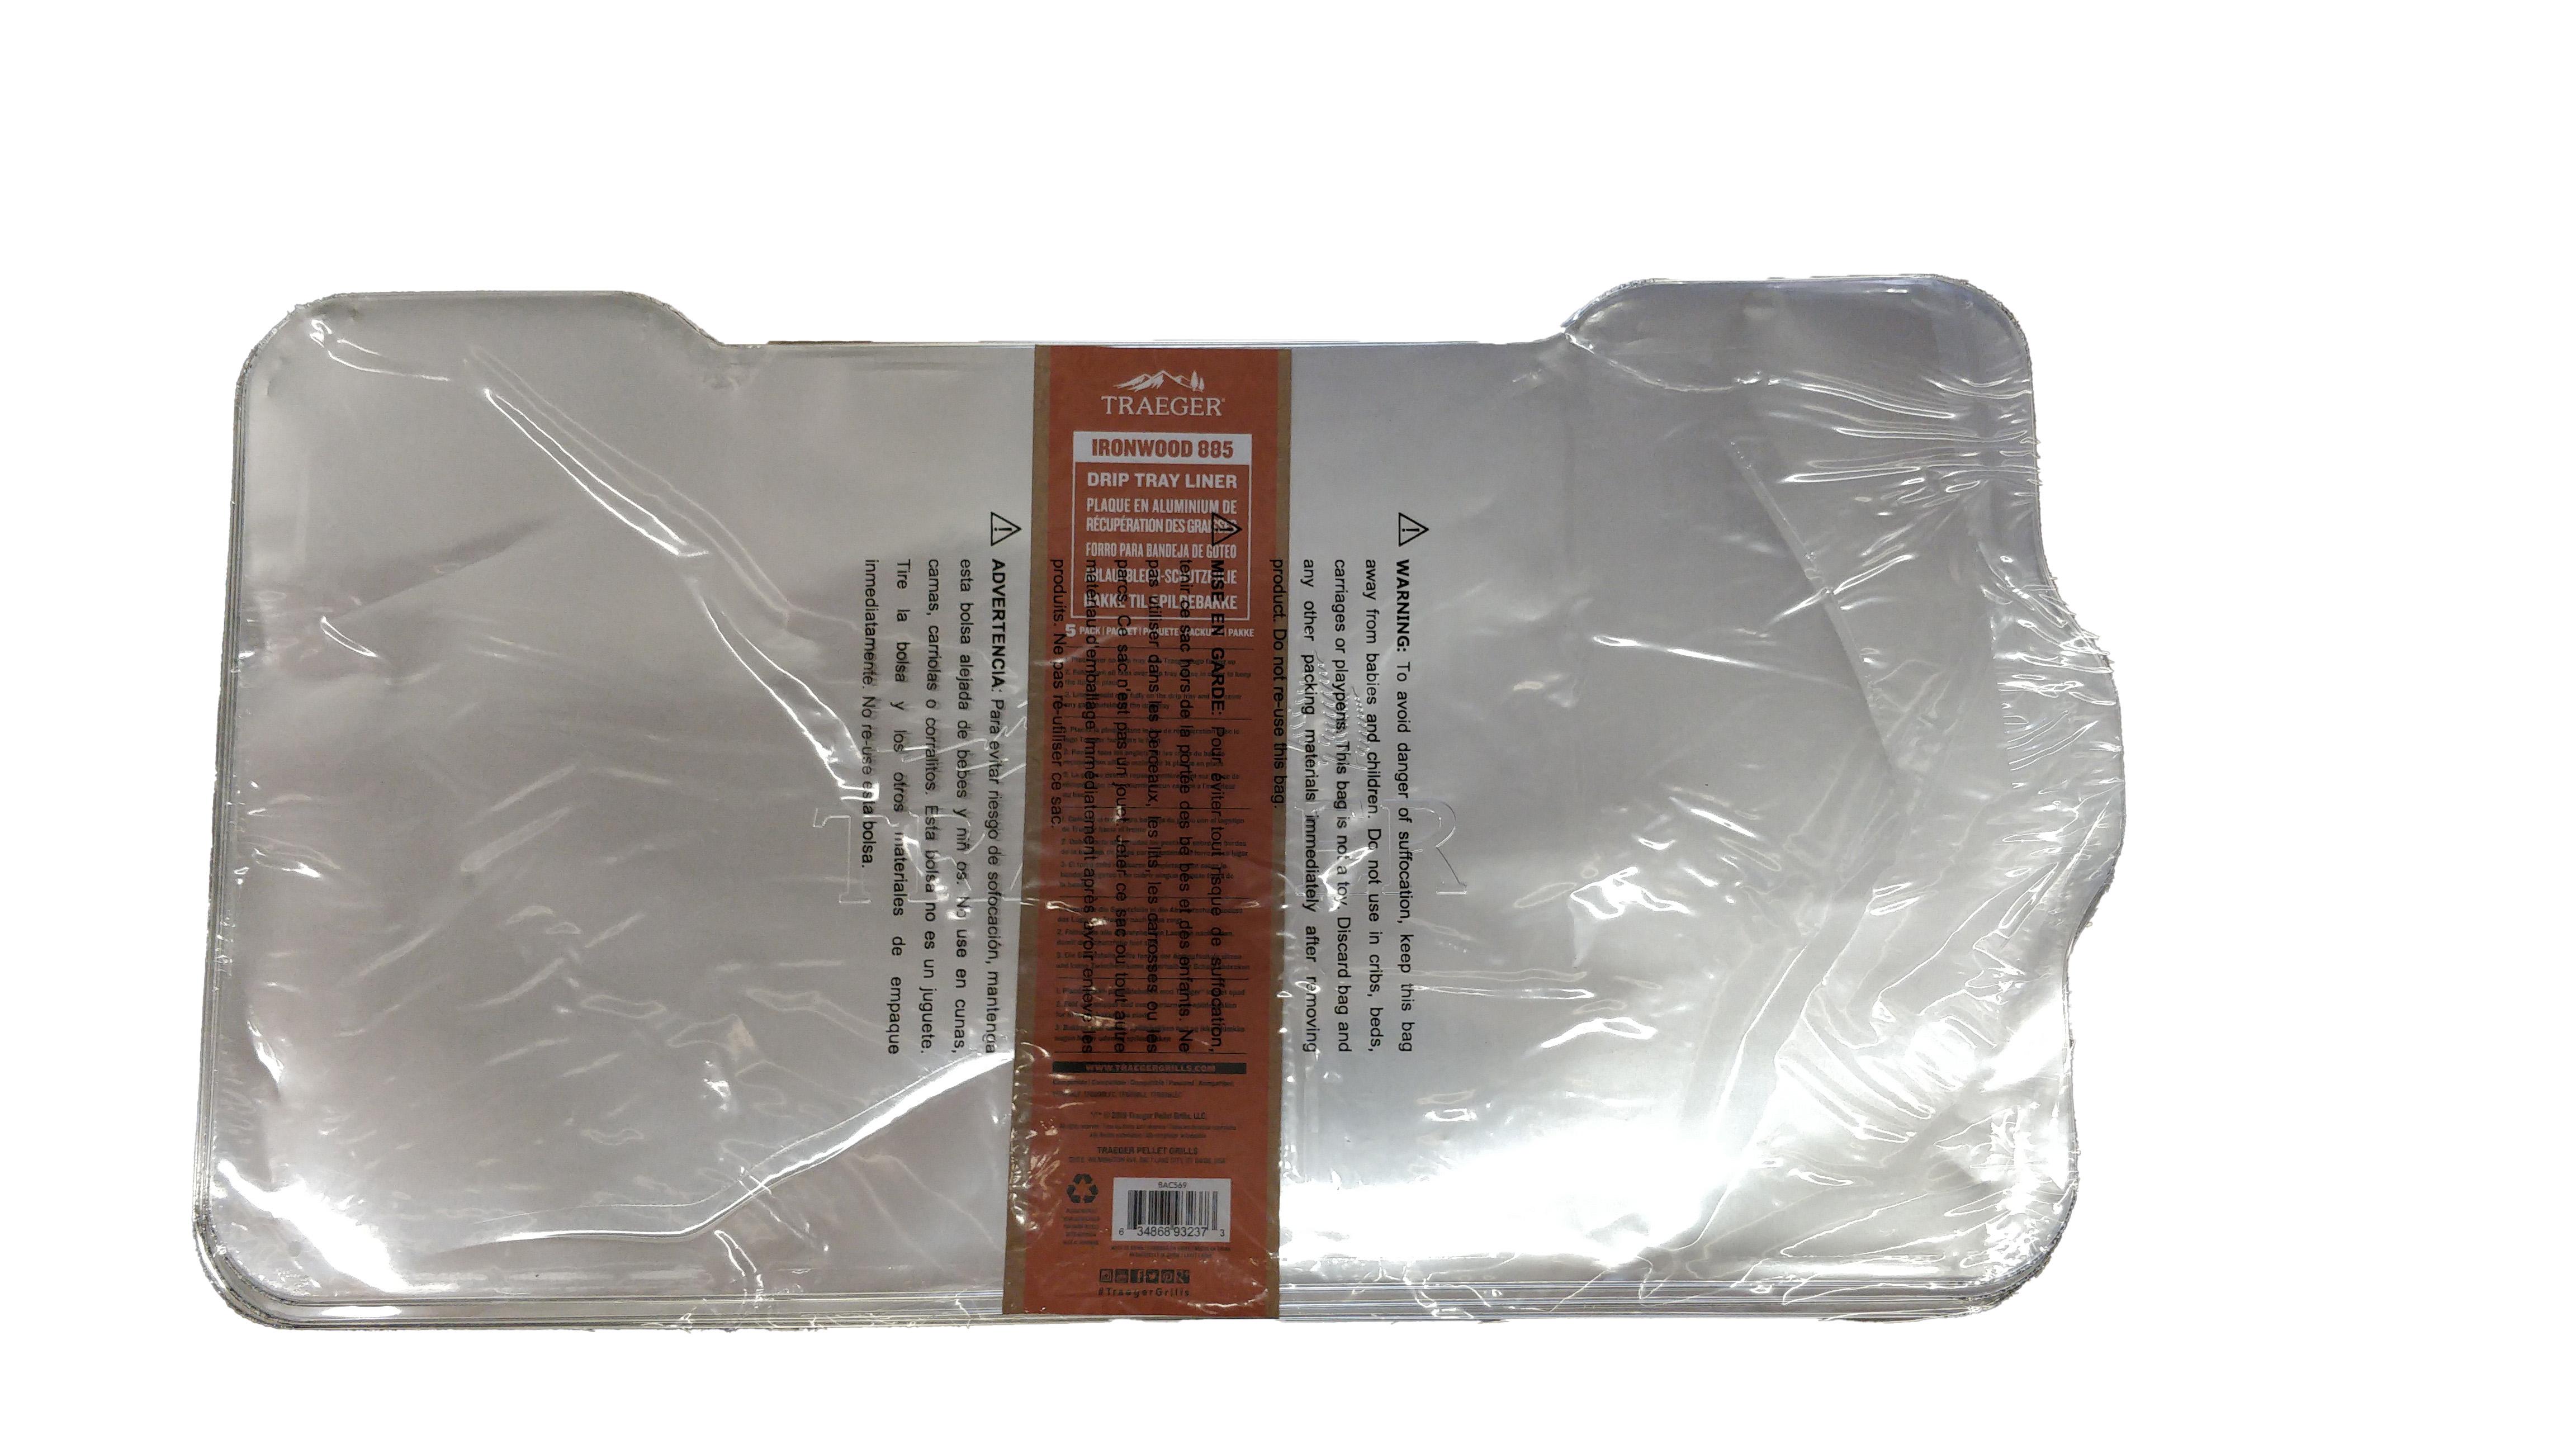 Traeger Ablaufblech-Schutzfolie für Ironwood 885 - 5 Pack